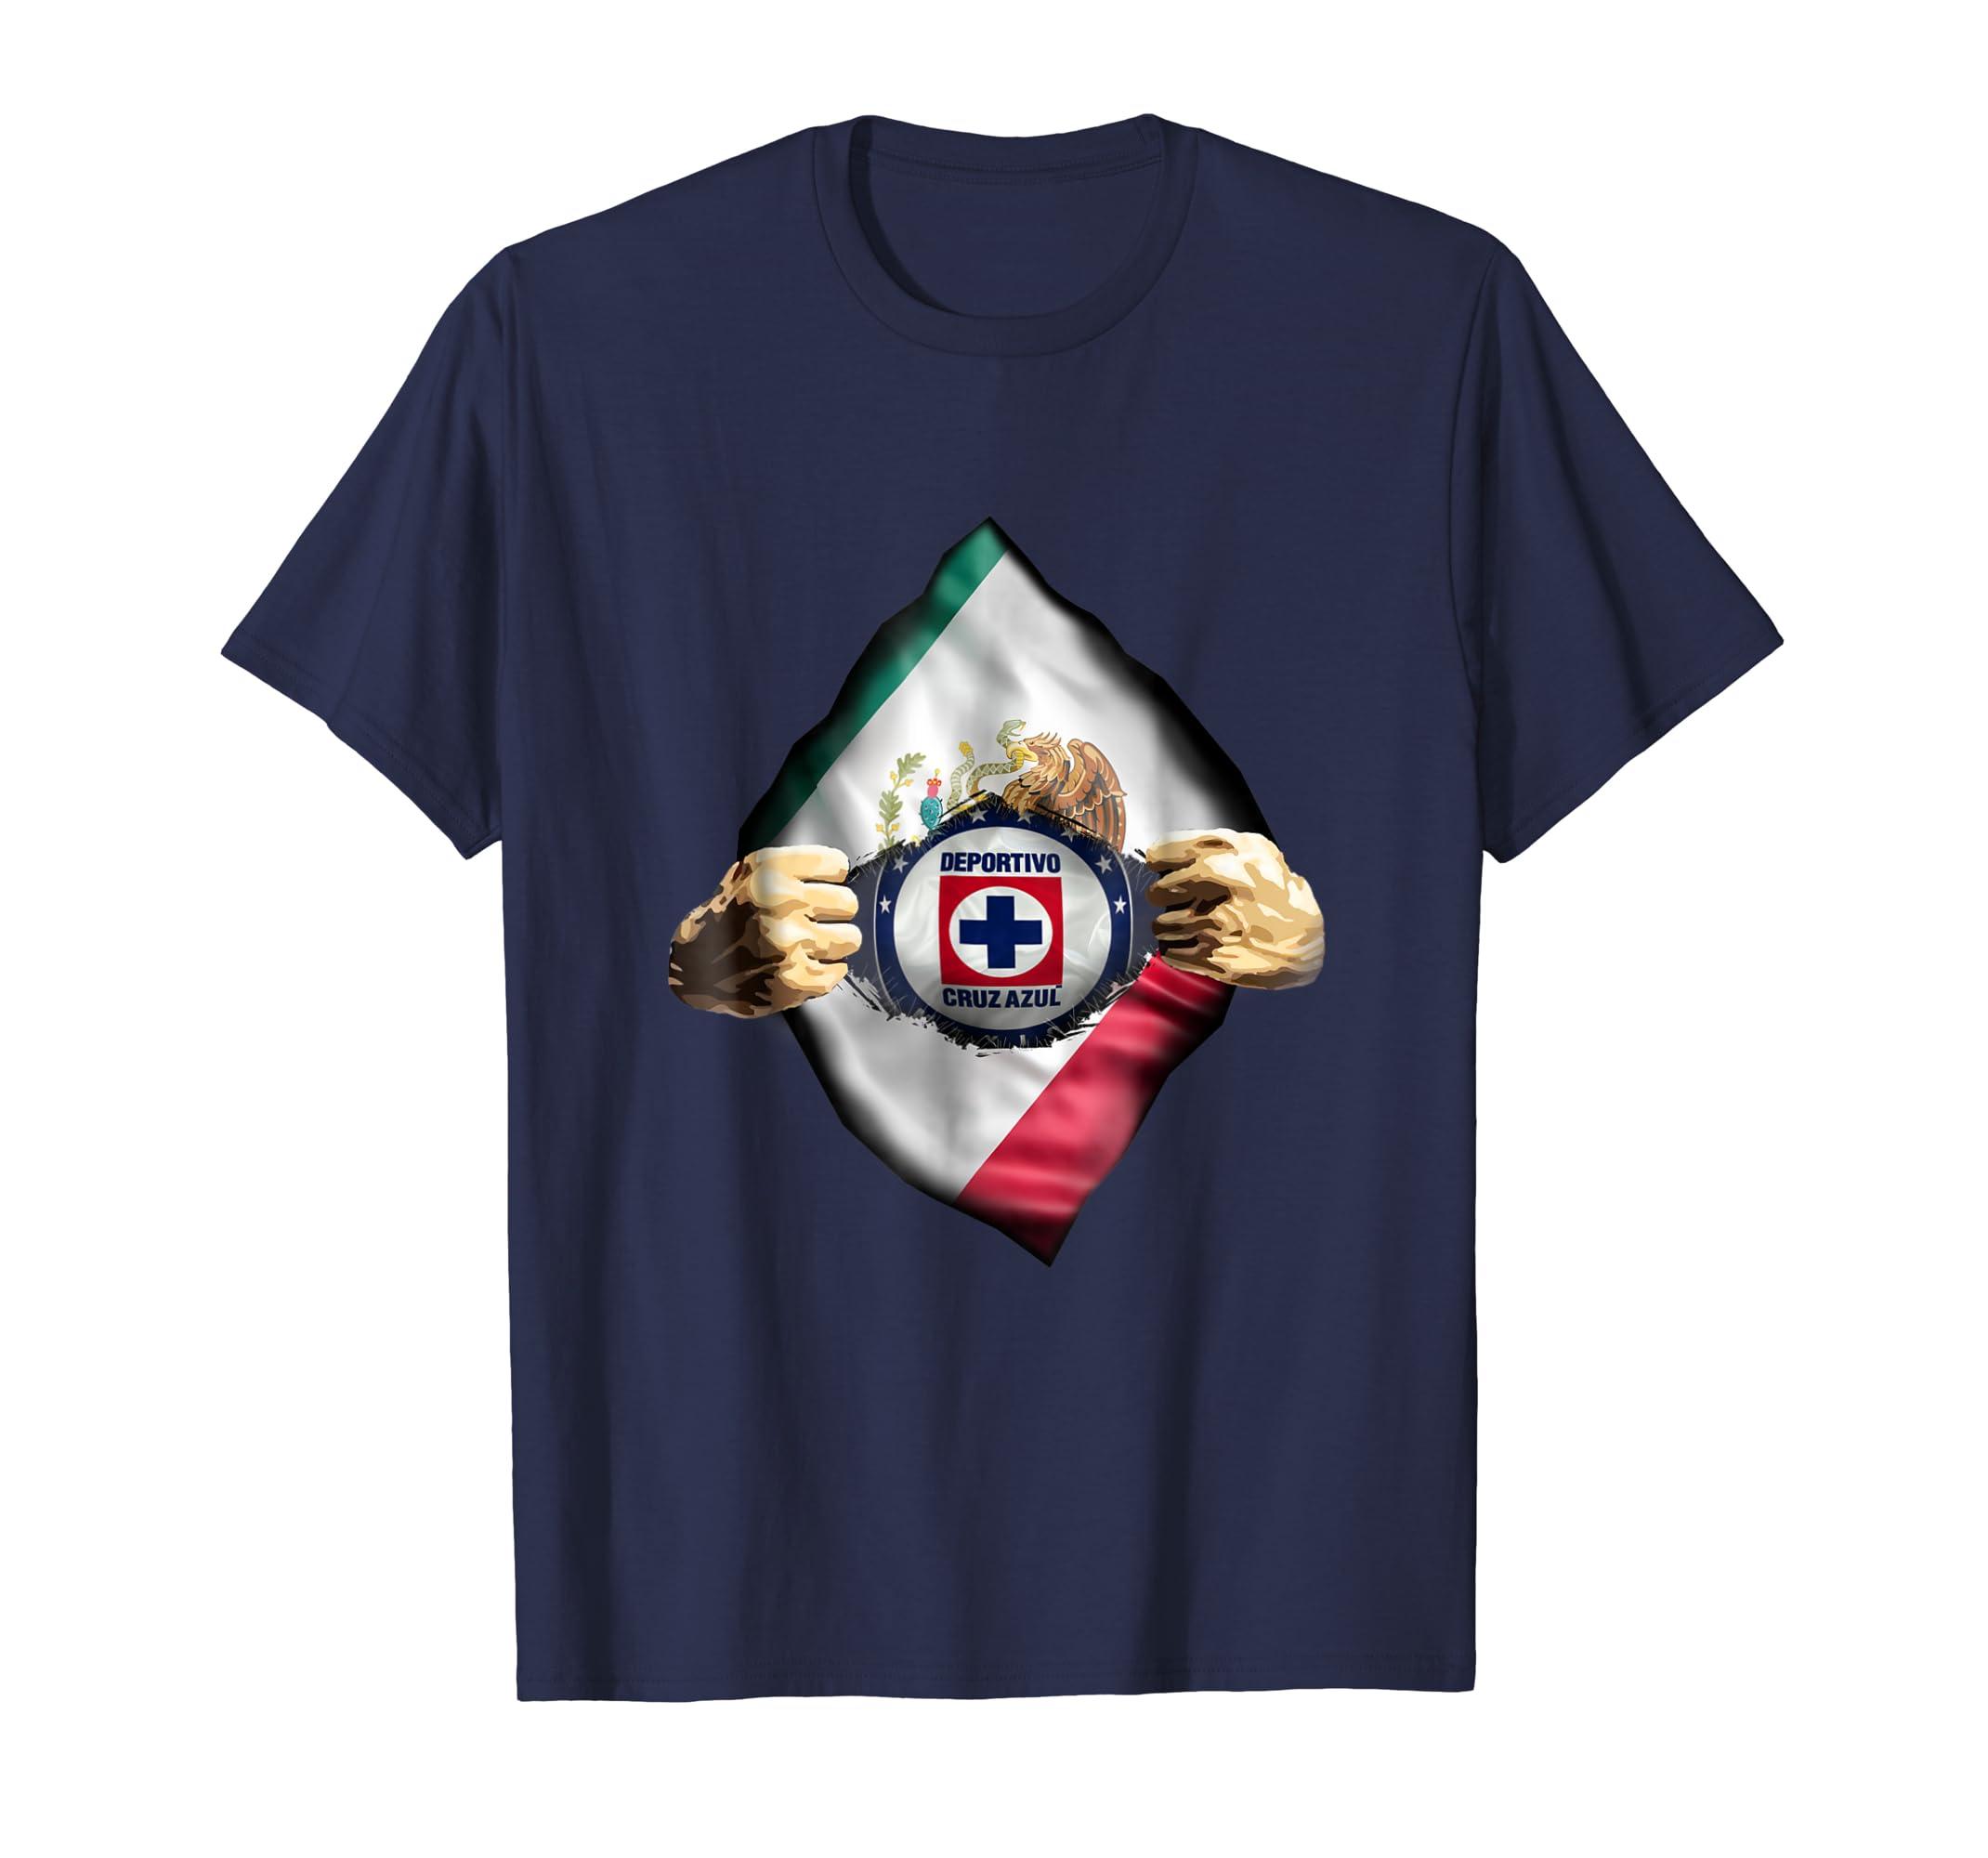 fd4df98c6 Amazon.com  Cruz Azul Shirt Heartbeat Love Funny Fan- Cruz Azul fc  Clothing